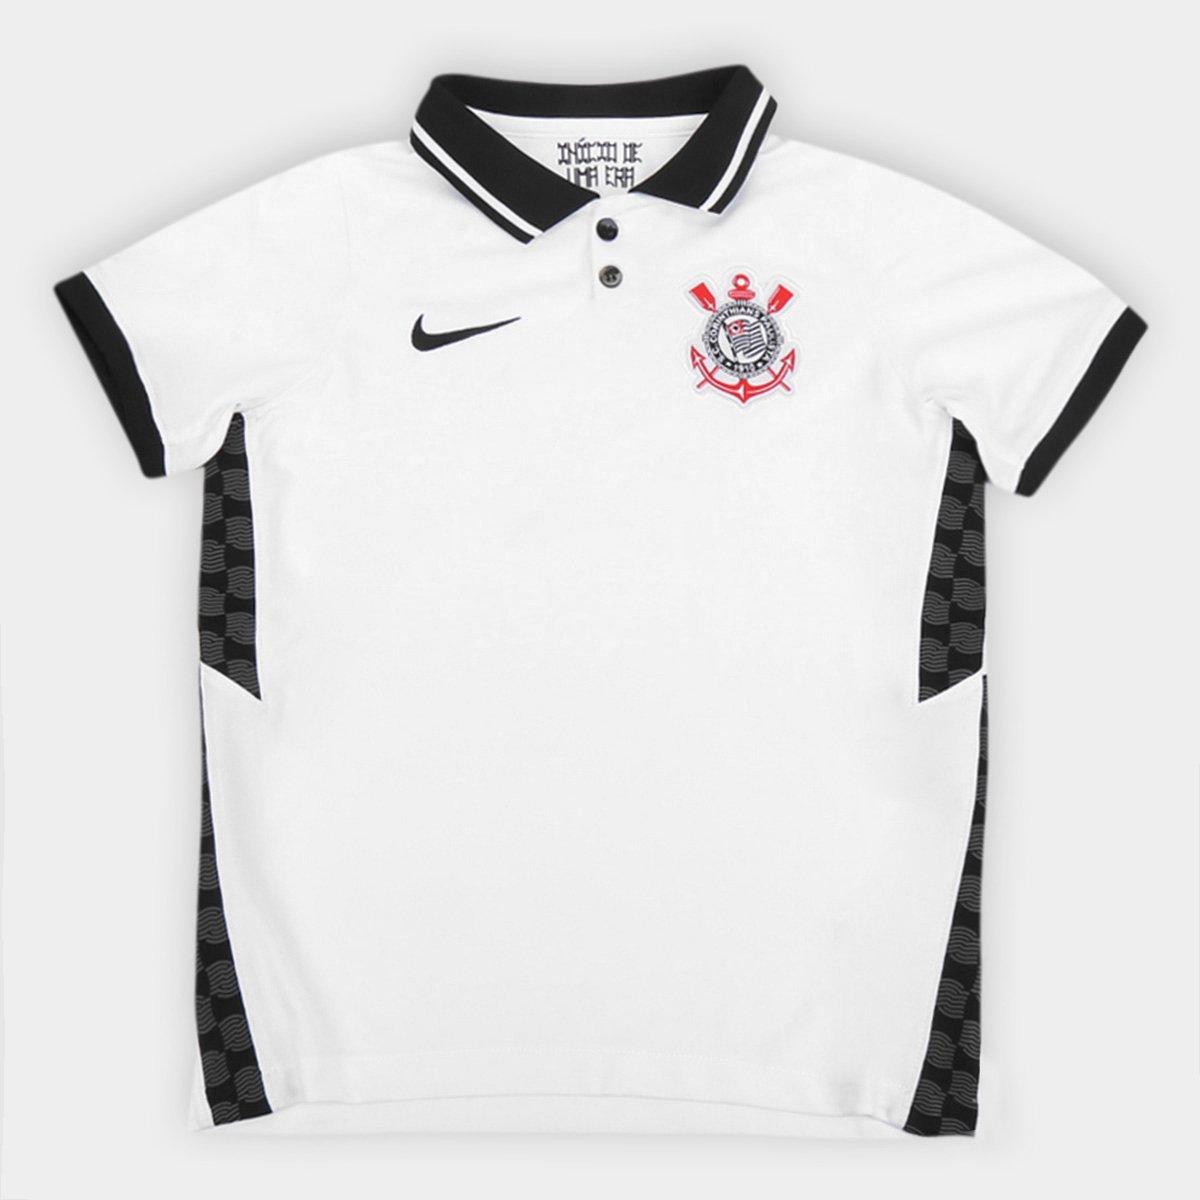 Fantasía Reproducir Cava  Camisa Corinthians Infantil I 20/21 s/n° Torcedor Nike - nike air match  mens shoe   Sergioabranches